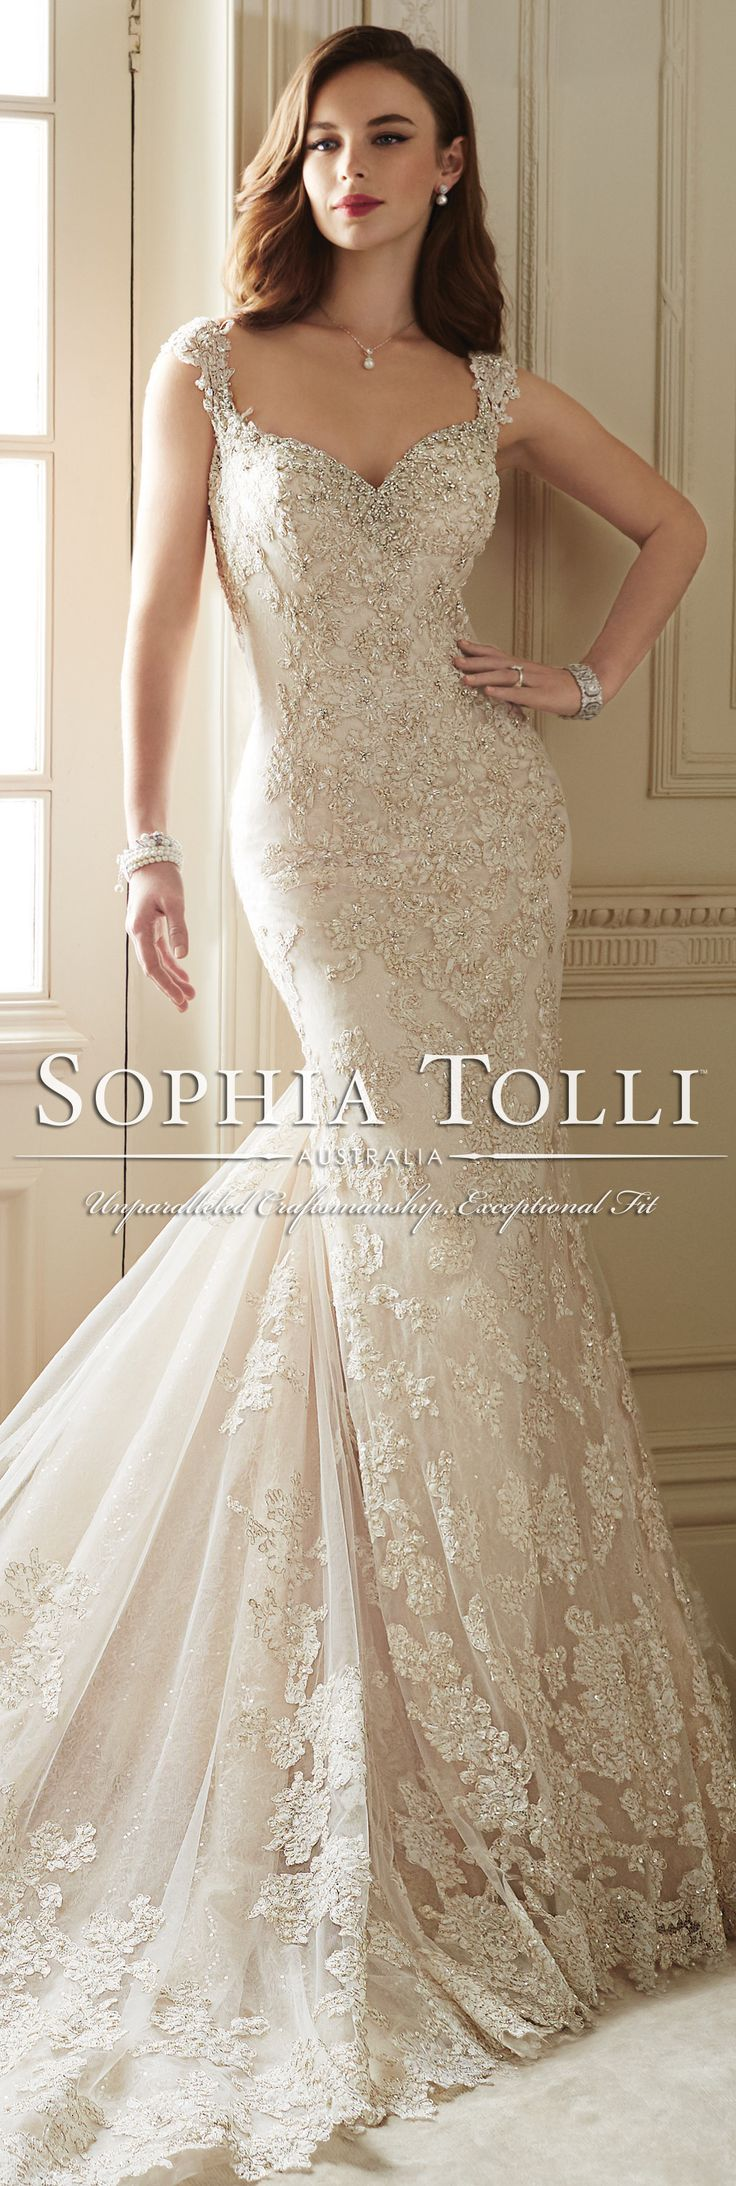 The Sophia Tolli Spring 2016 Wedding Dress Collection - Style No. Y11651 - Sultana #laceweddingdress